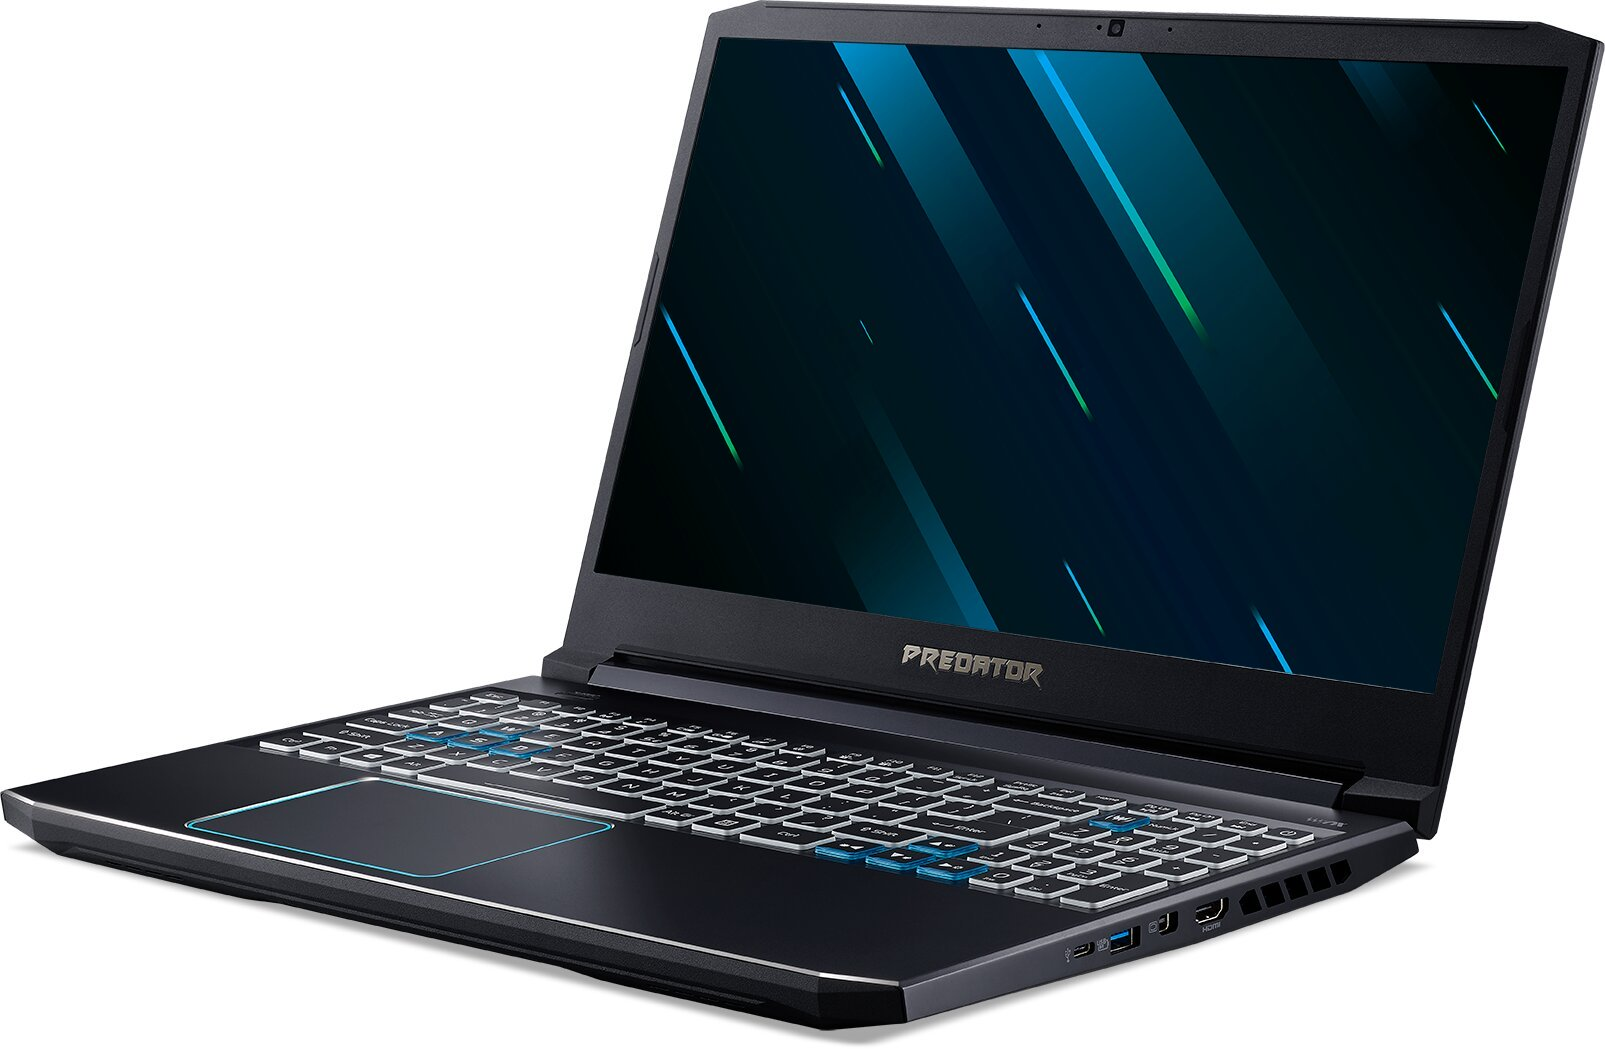 Acer Predator Helios 300 PH315-52-754H